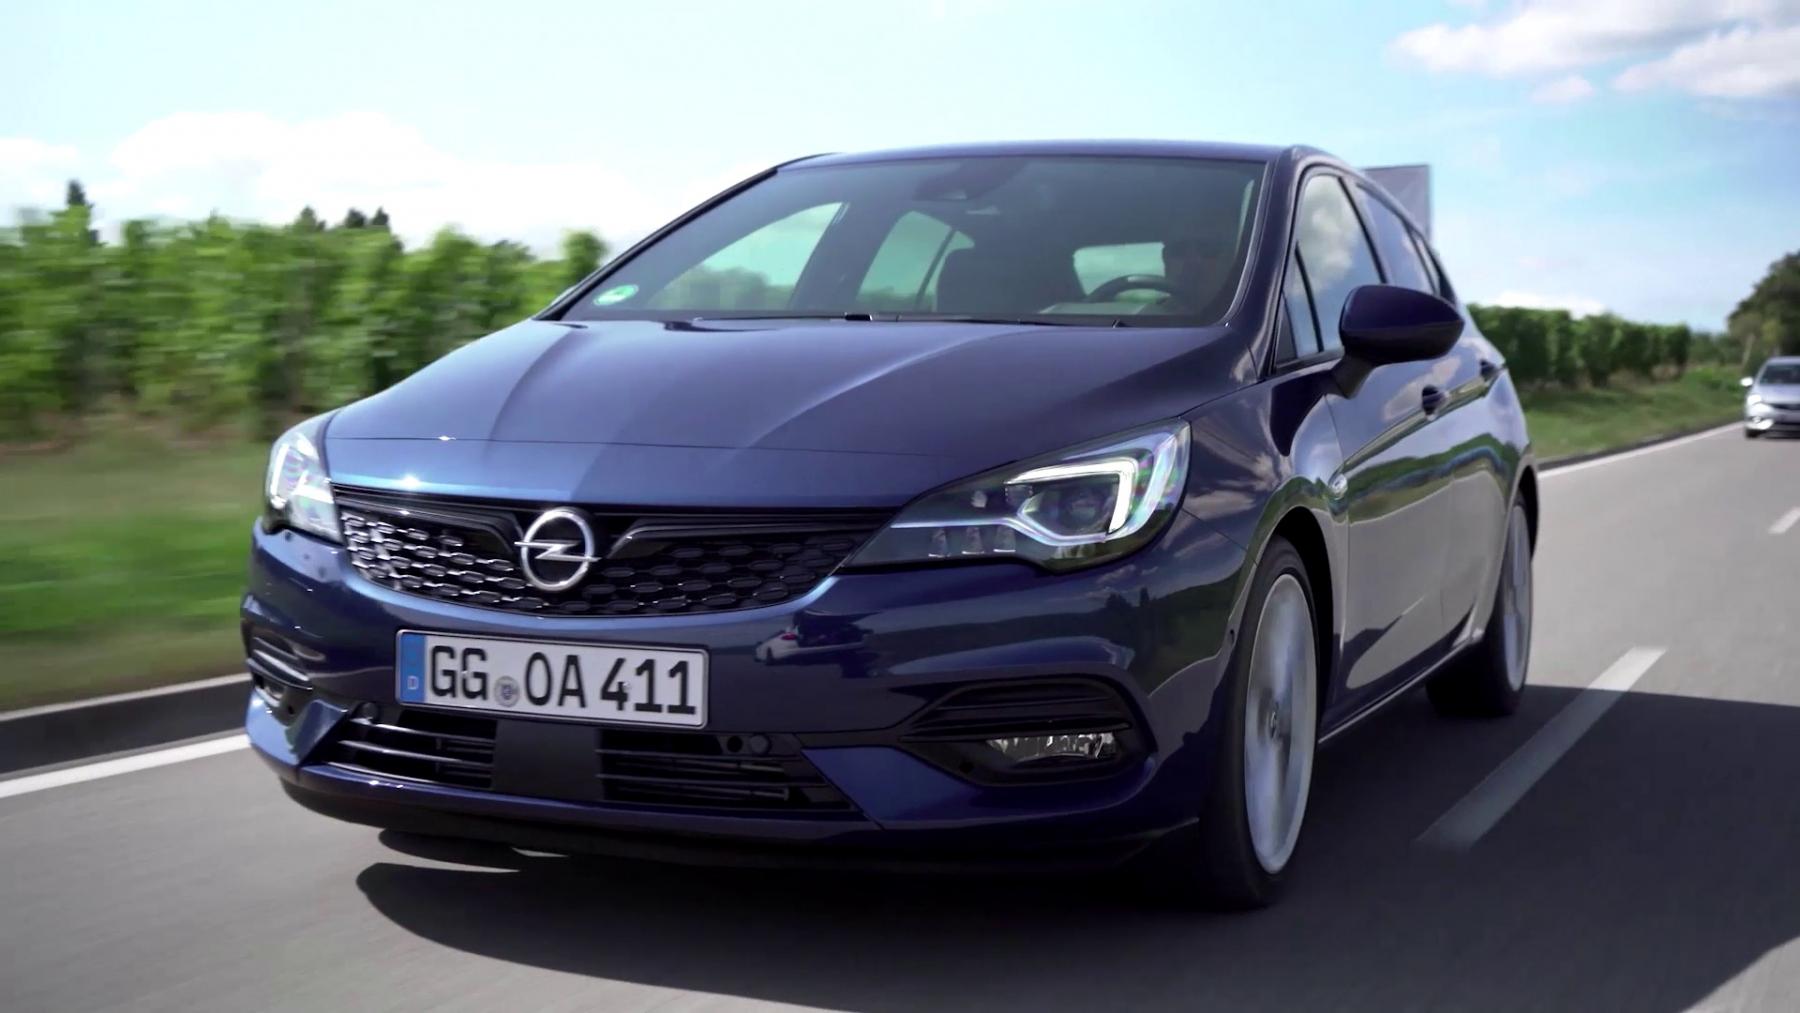 Opel Astra 2019